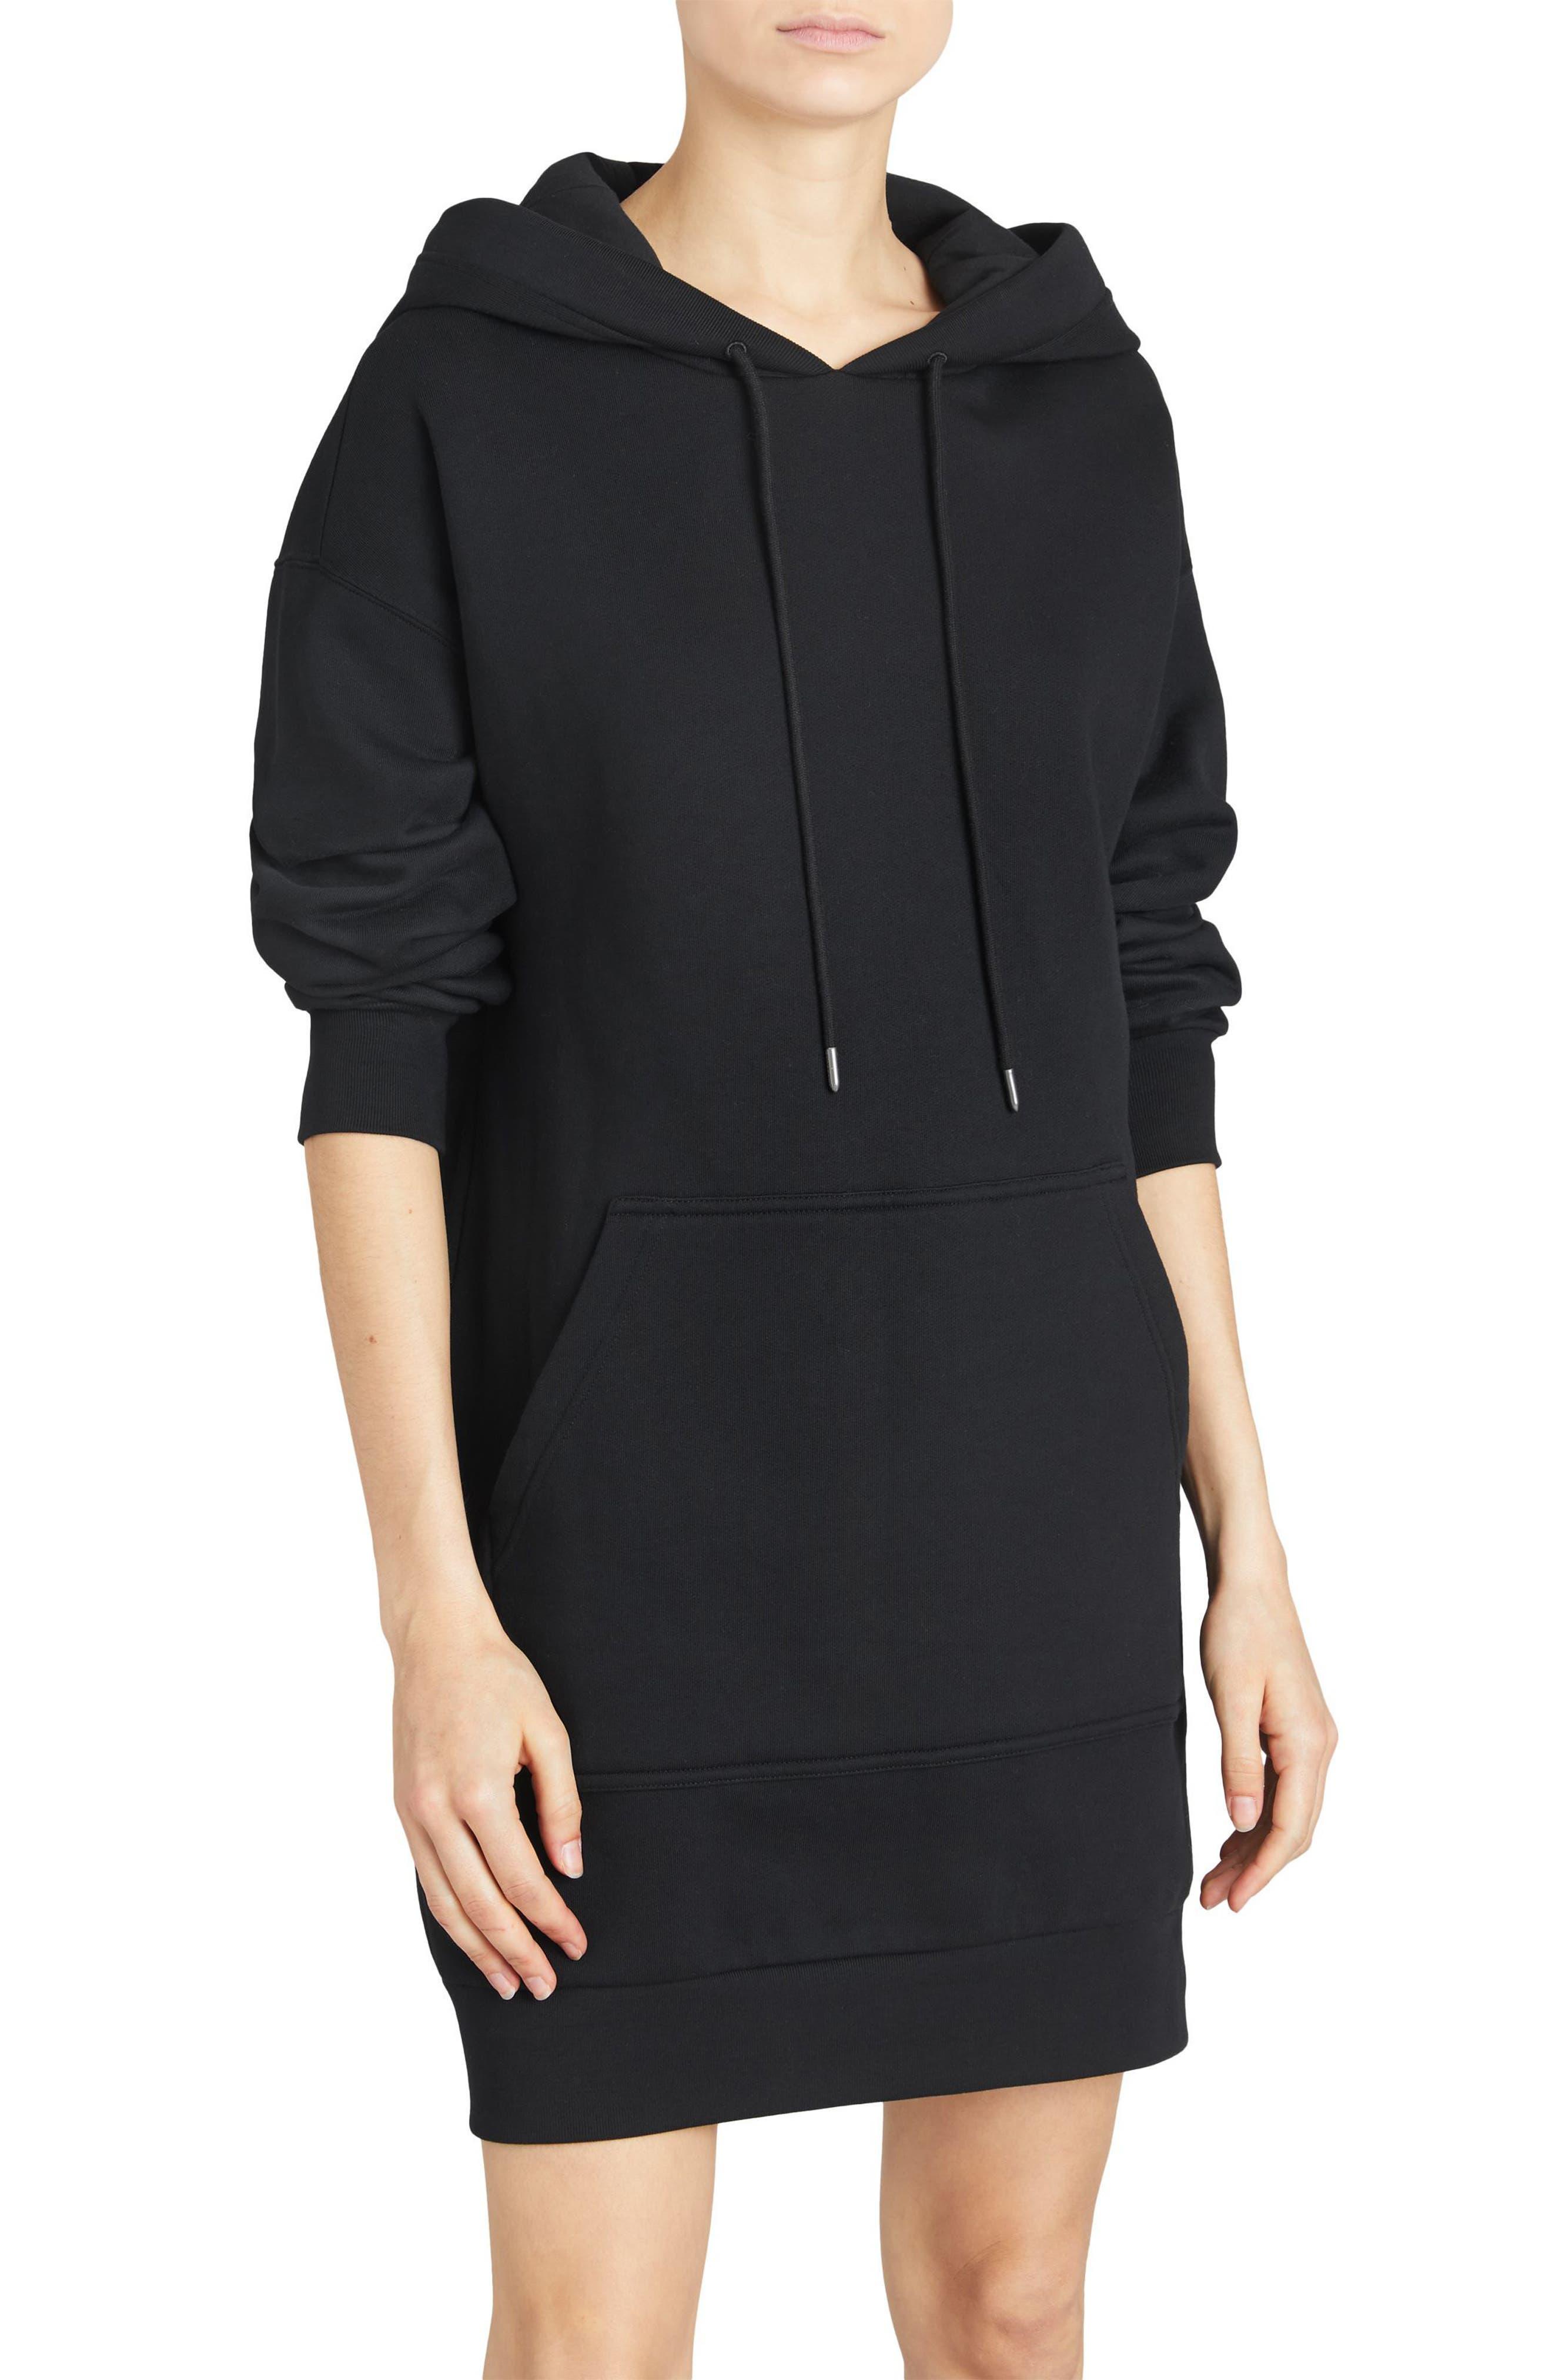 Cardeiver Jersey Sweatshirt Dress,                         Main,                         color, 001